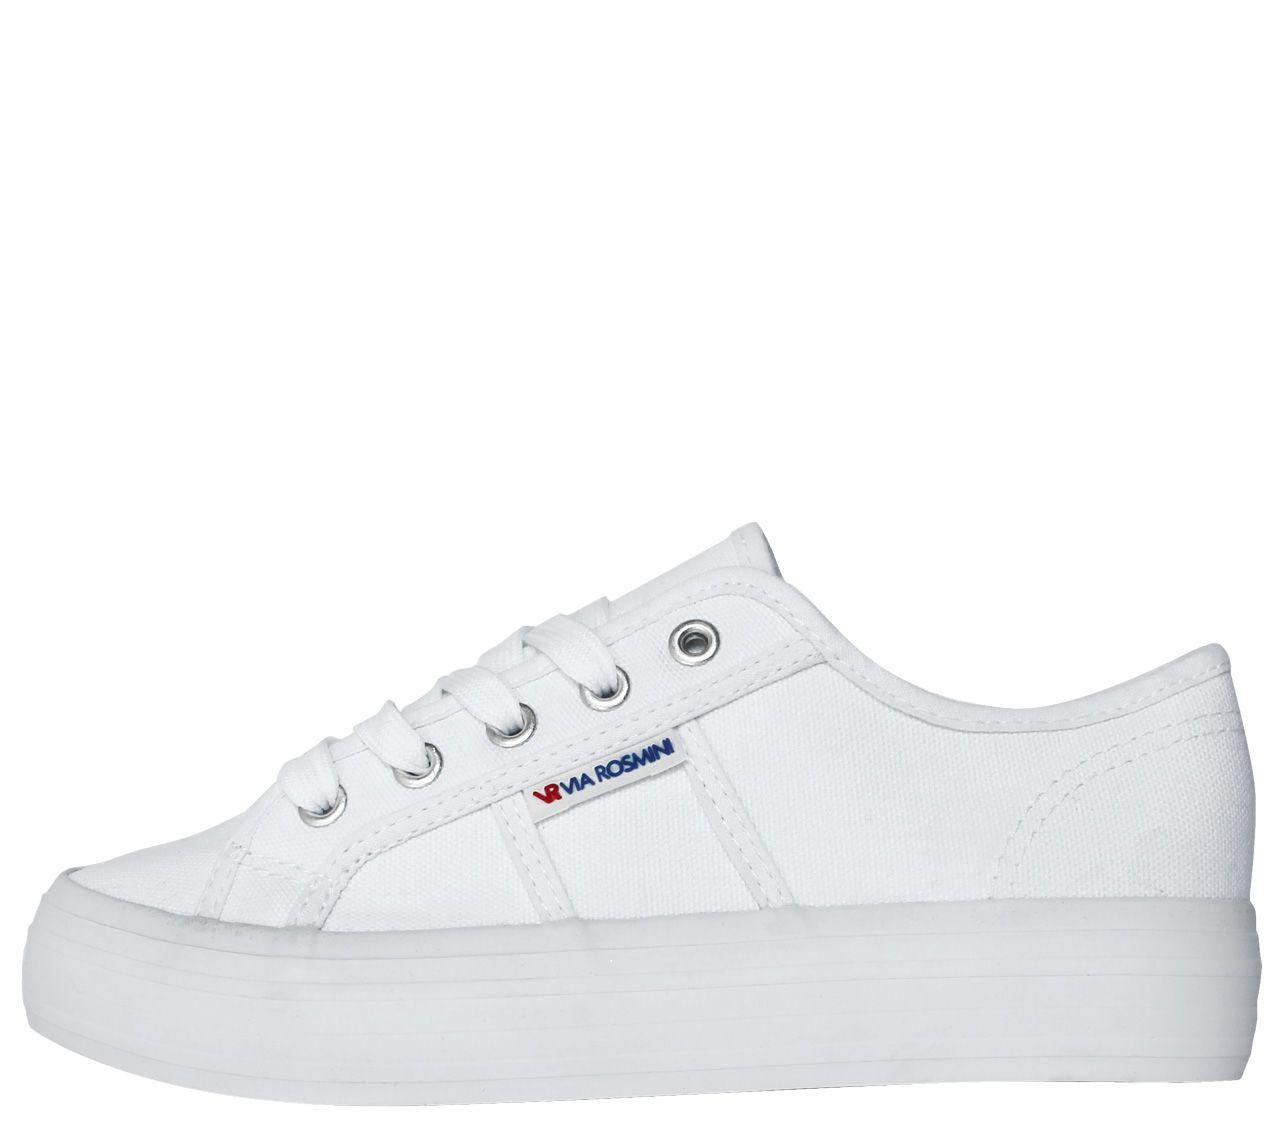 LJE1516 White